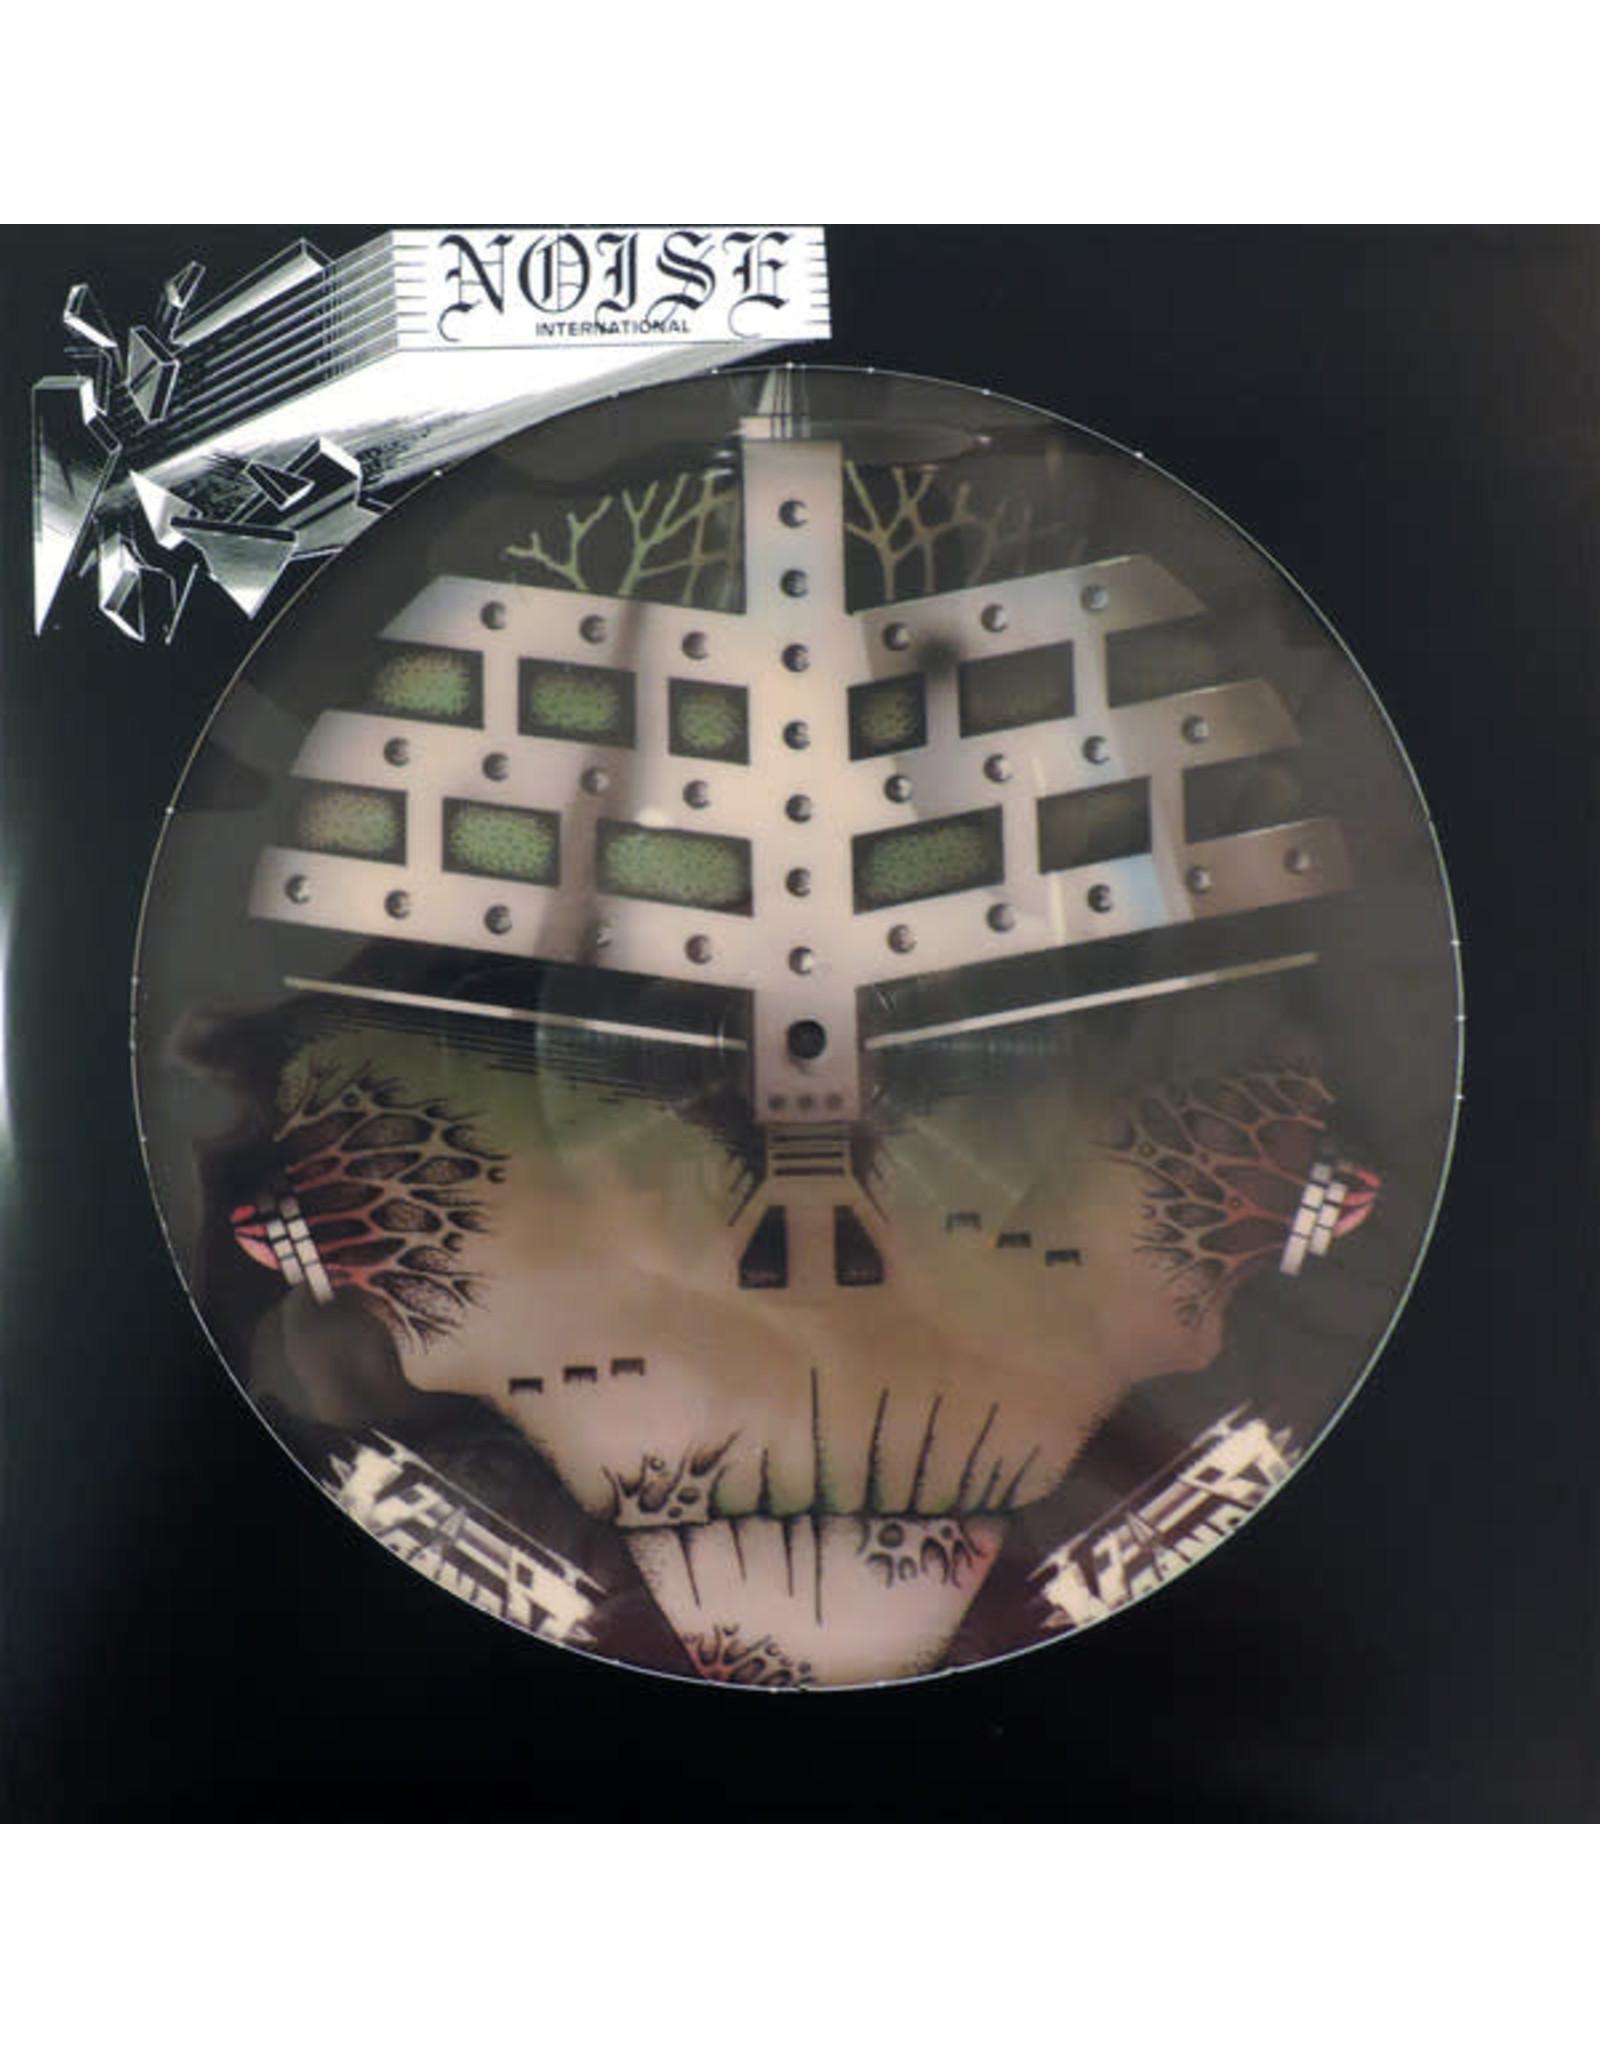 Voivod - Too Scared To Scream LP (Picture Disc)